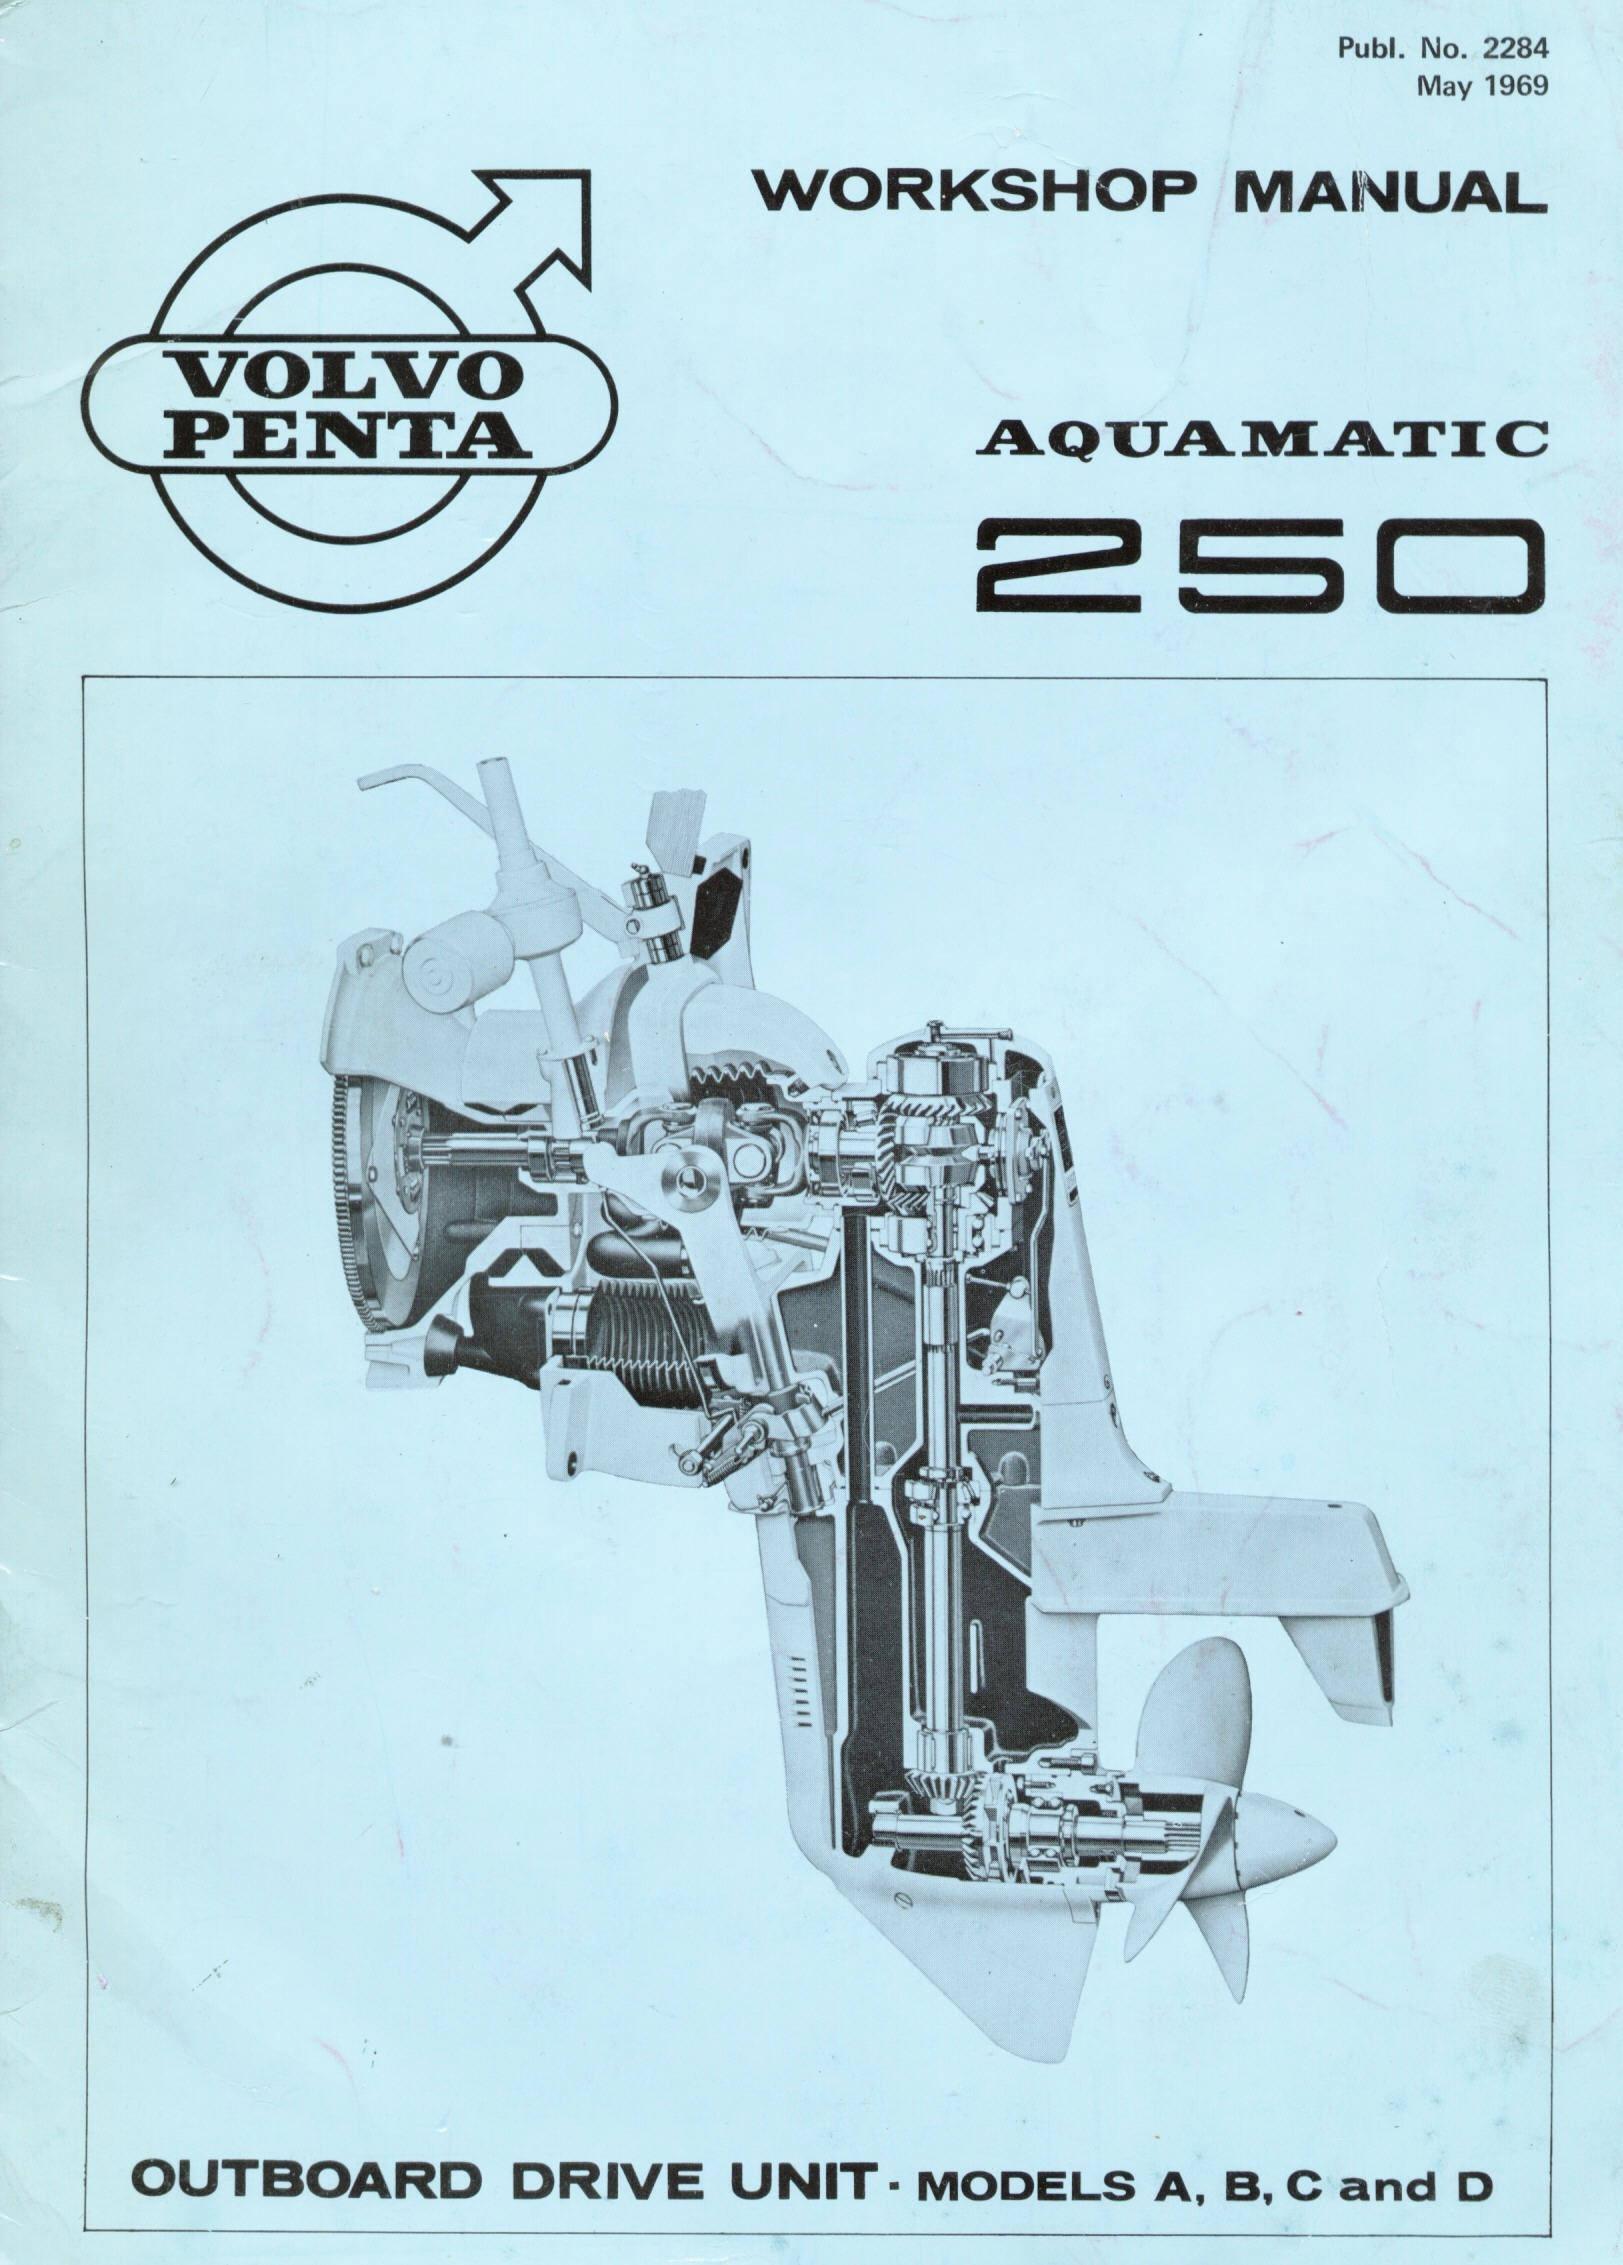 volvo marine engine service manuals for mechanics rh sellfy com Volvo Manual Trans volvo aq 130 service manual